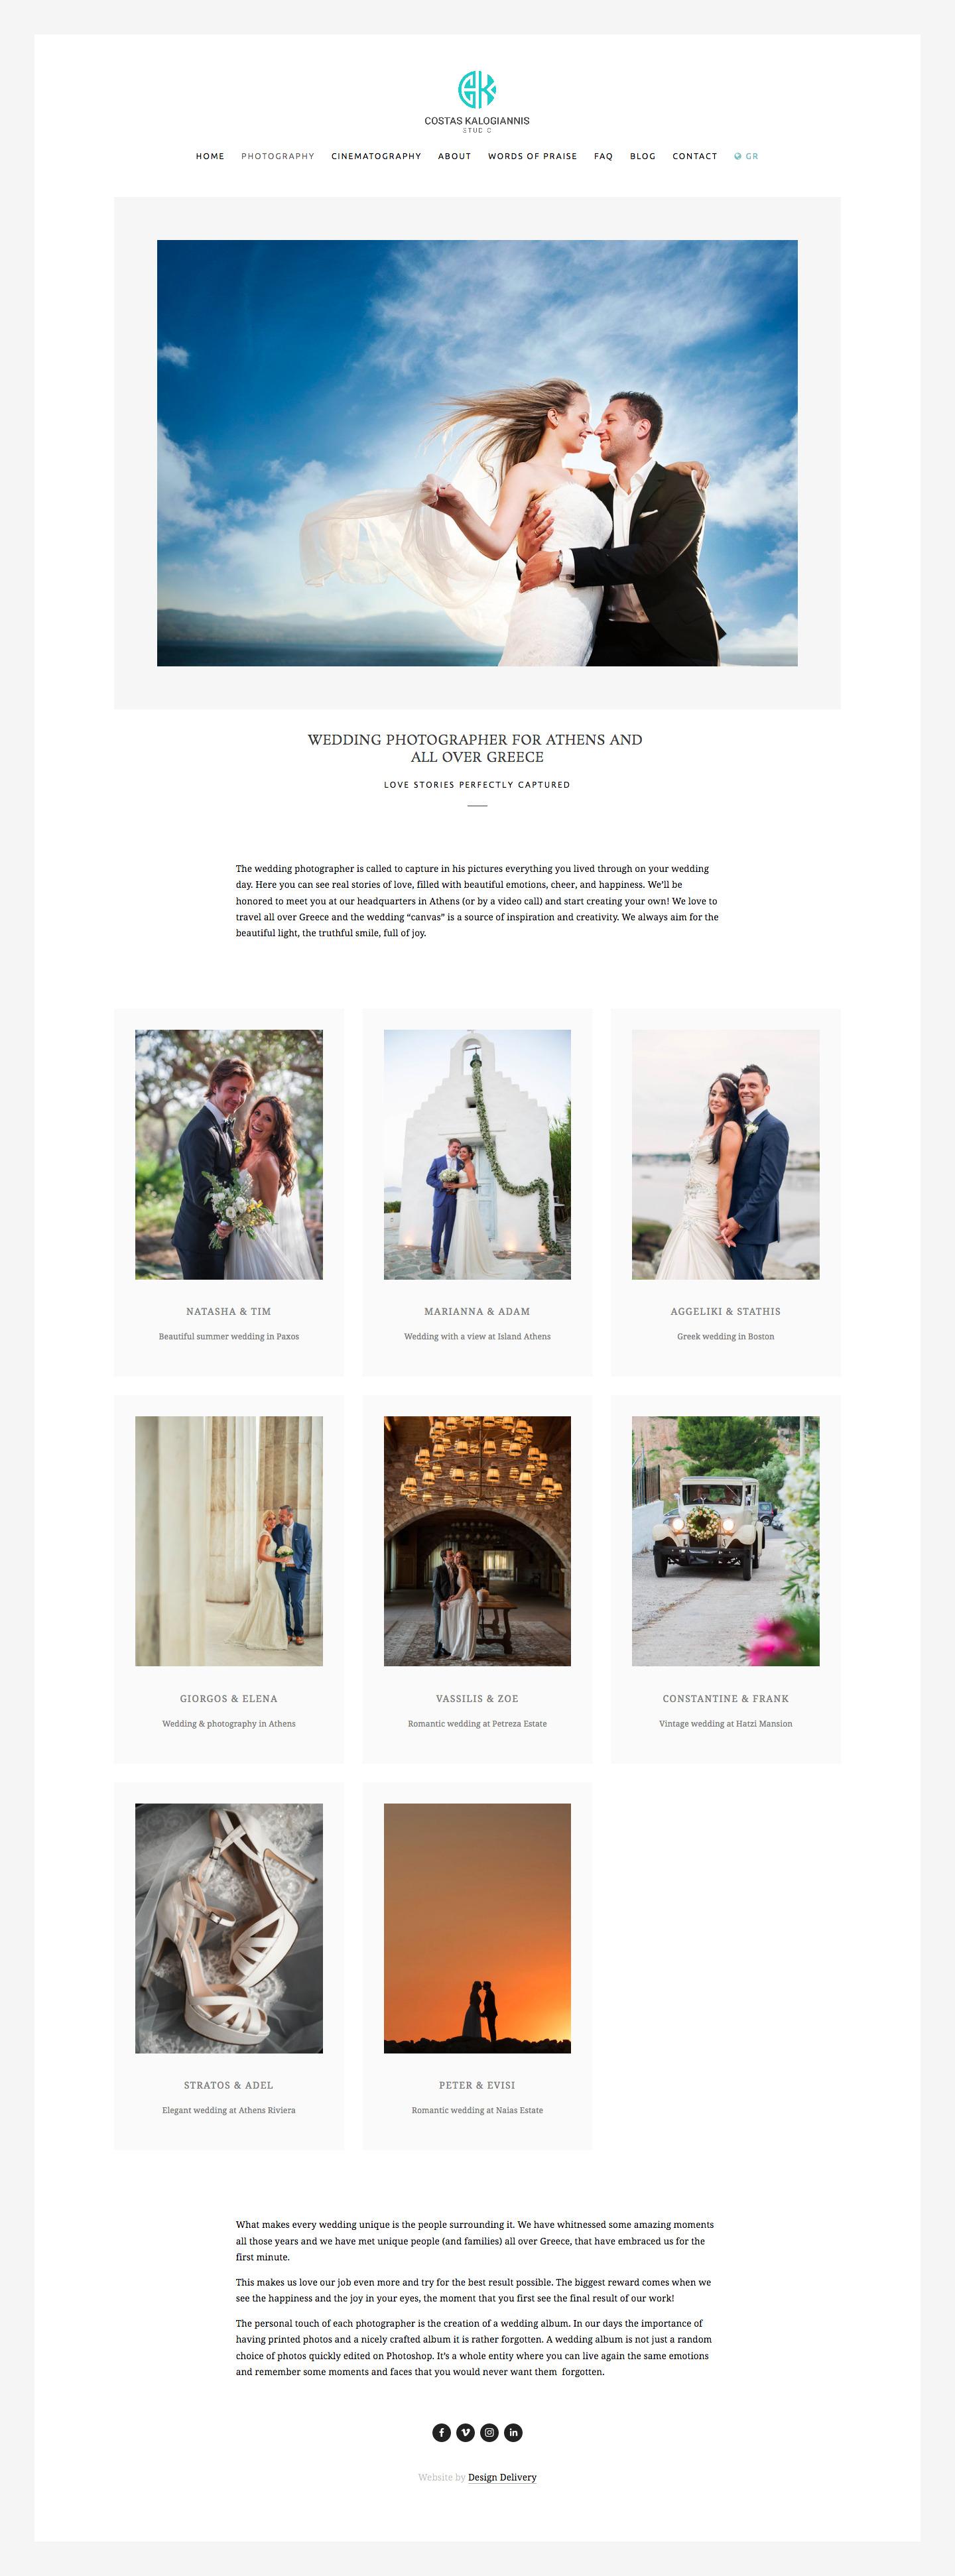 Screenshot_2018-12-21 WEDDING PHOTOGRAPHER — K Studio Kostas Kalogiannis(1).jpg